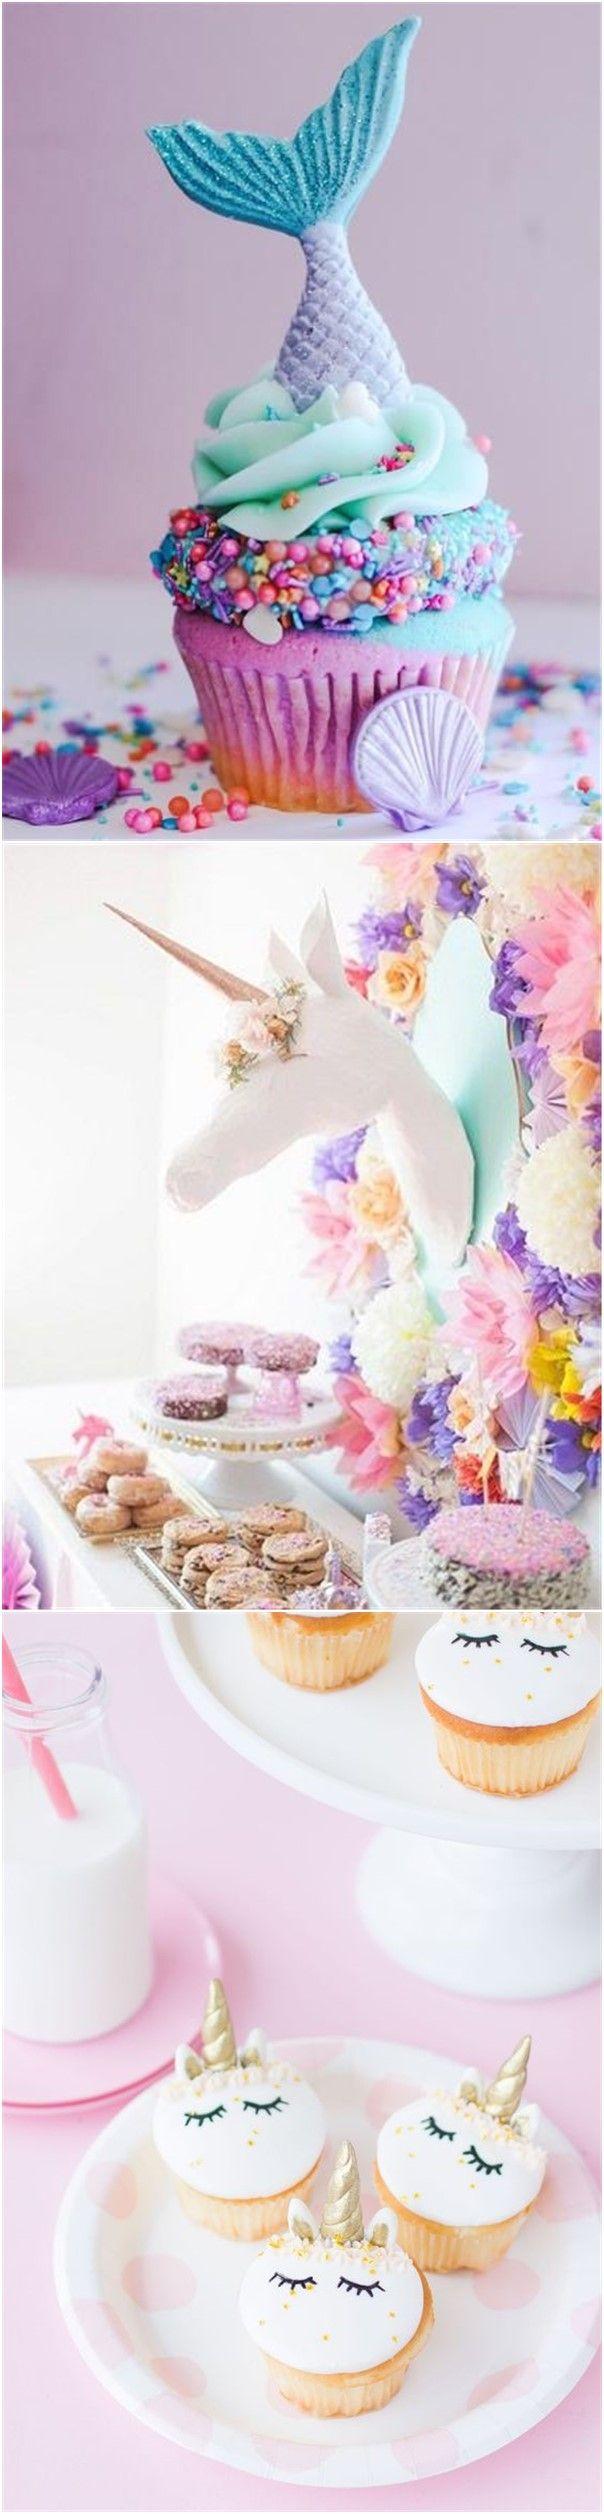 Bridal Shower » 23 Unicorn Bridal Shower Party Ideas » ❤️ See more: http://www.weddinginclude.com/2017/07/unicorn-bridal-shower-party-ideas/